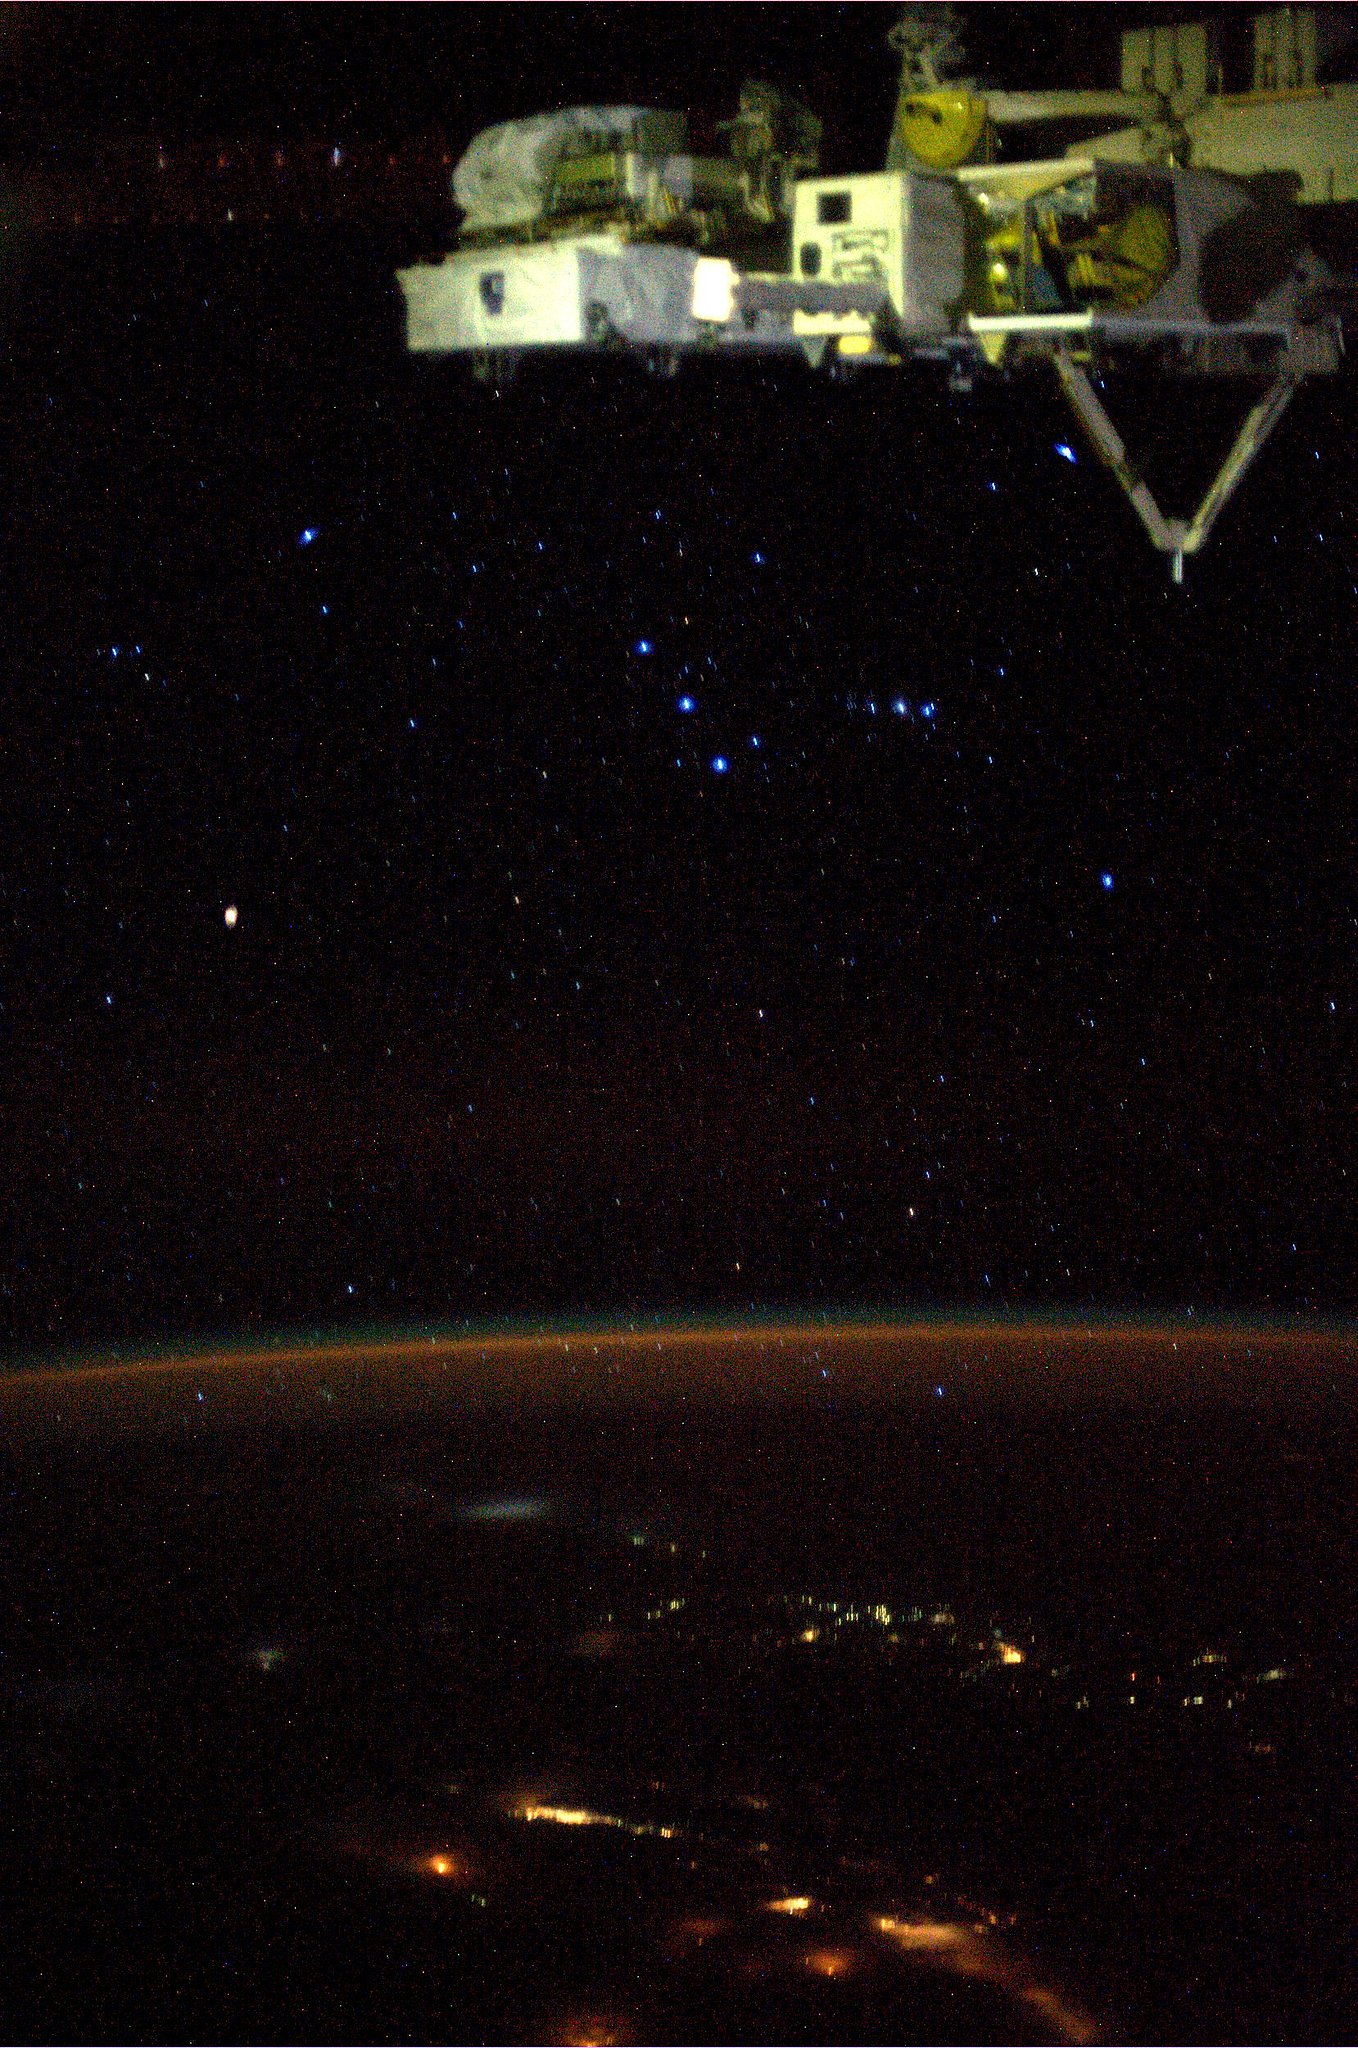 """Orion. Taken August 15, 2013. KN from space."" Source: Pinterest user Karen Nyberg"